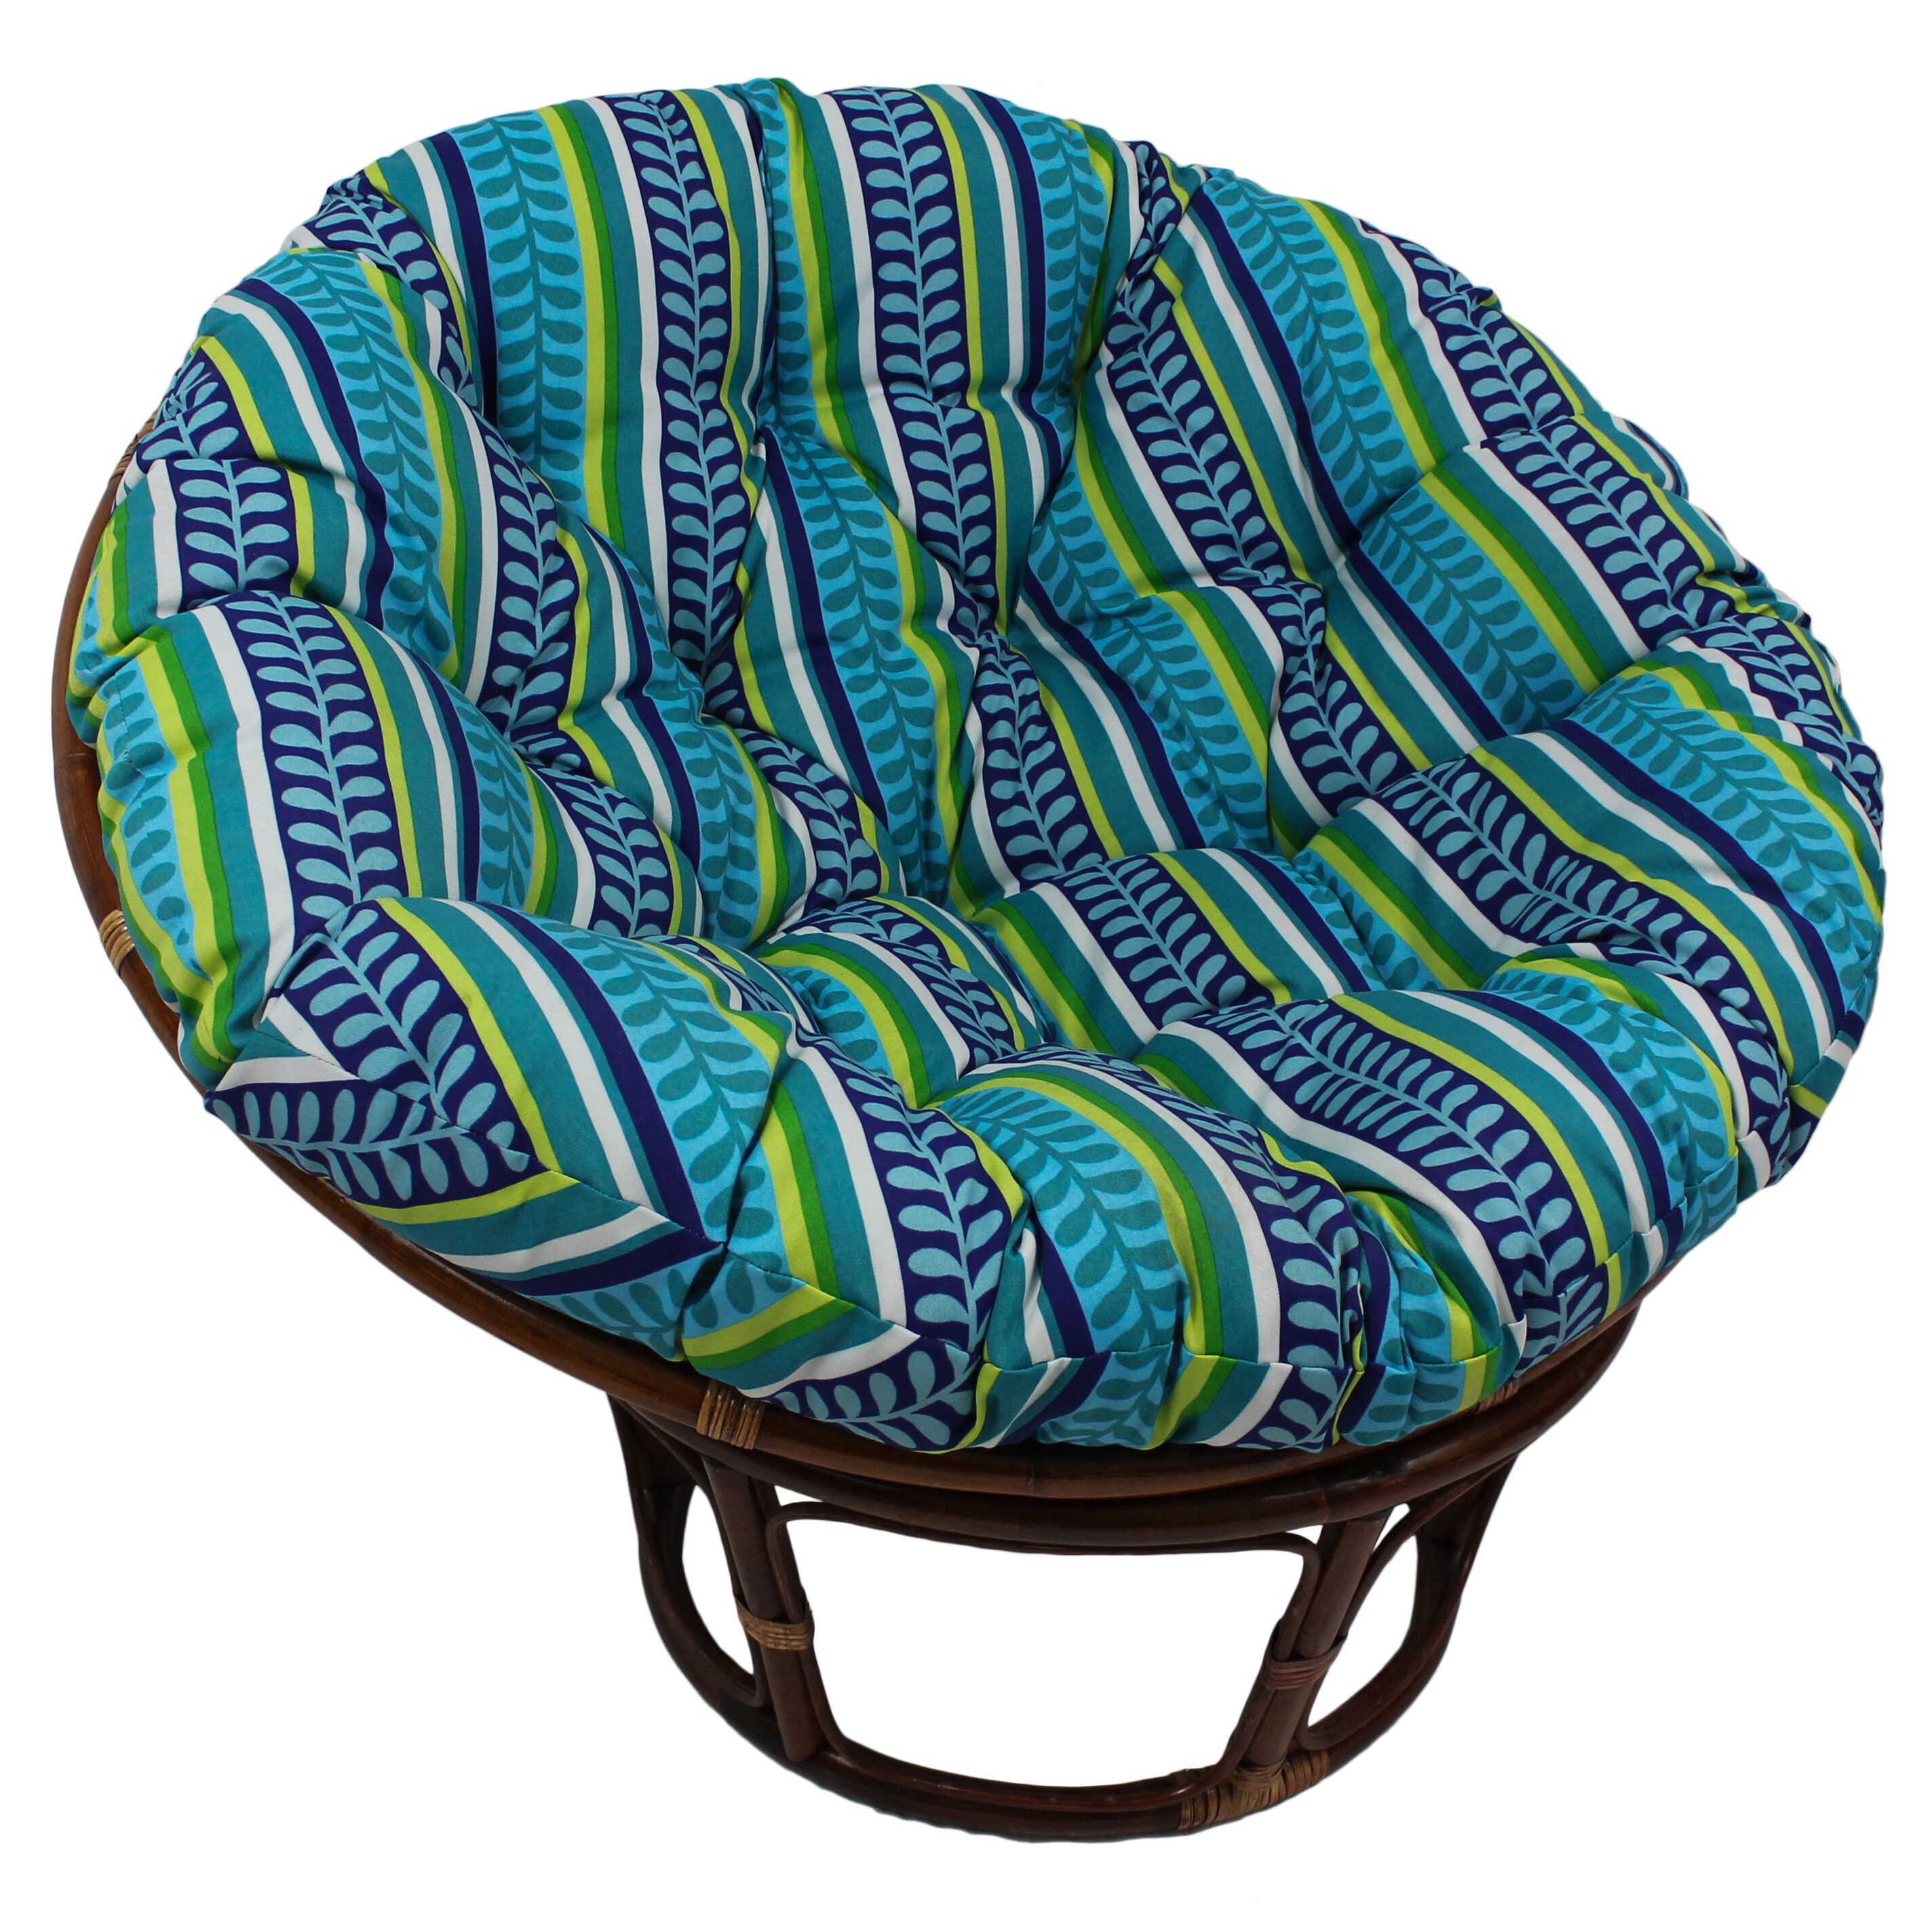 Incroyable Blazing Needles Outdoor Papasan Cushion U0026 Reviews | Wayfair